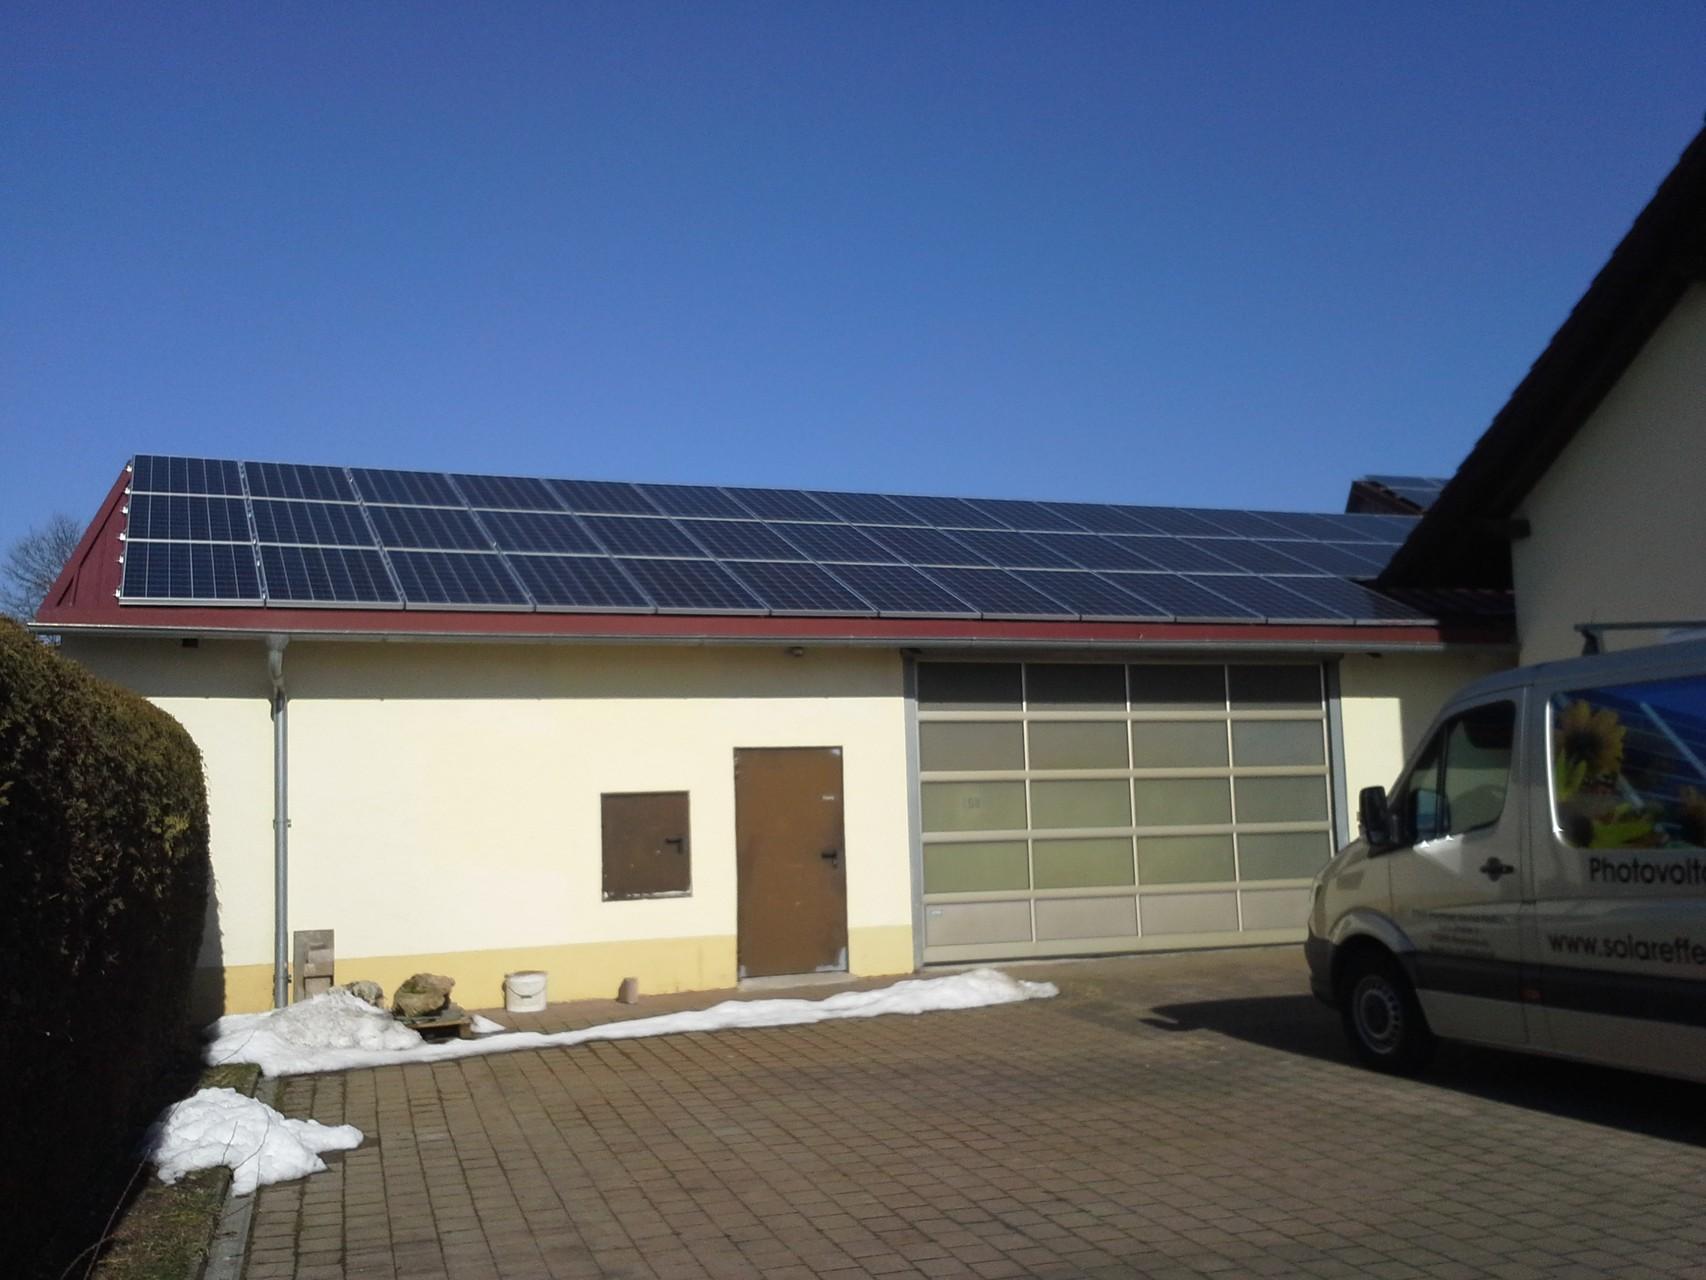 13,5 kWp Photovoltaikanlage 92345 Dietfurt a.d.Altmühl SHARP Modulen 15.0 Symo Fronius Wechselrichter